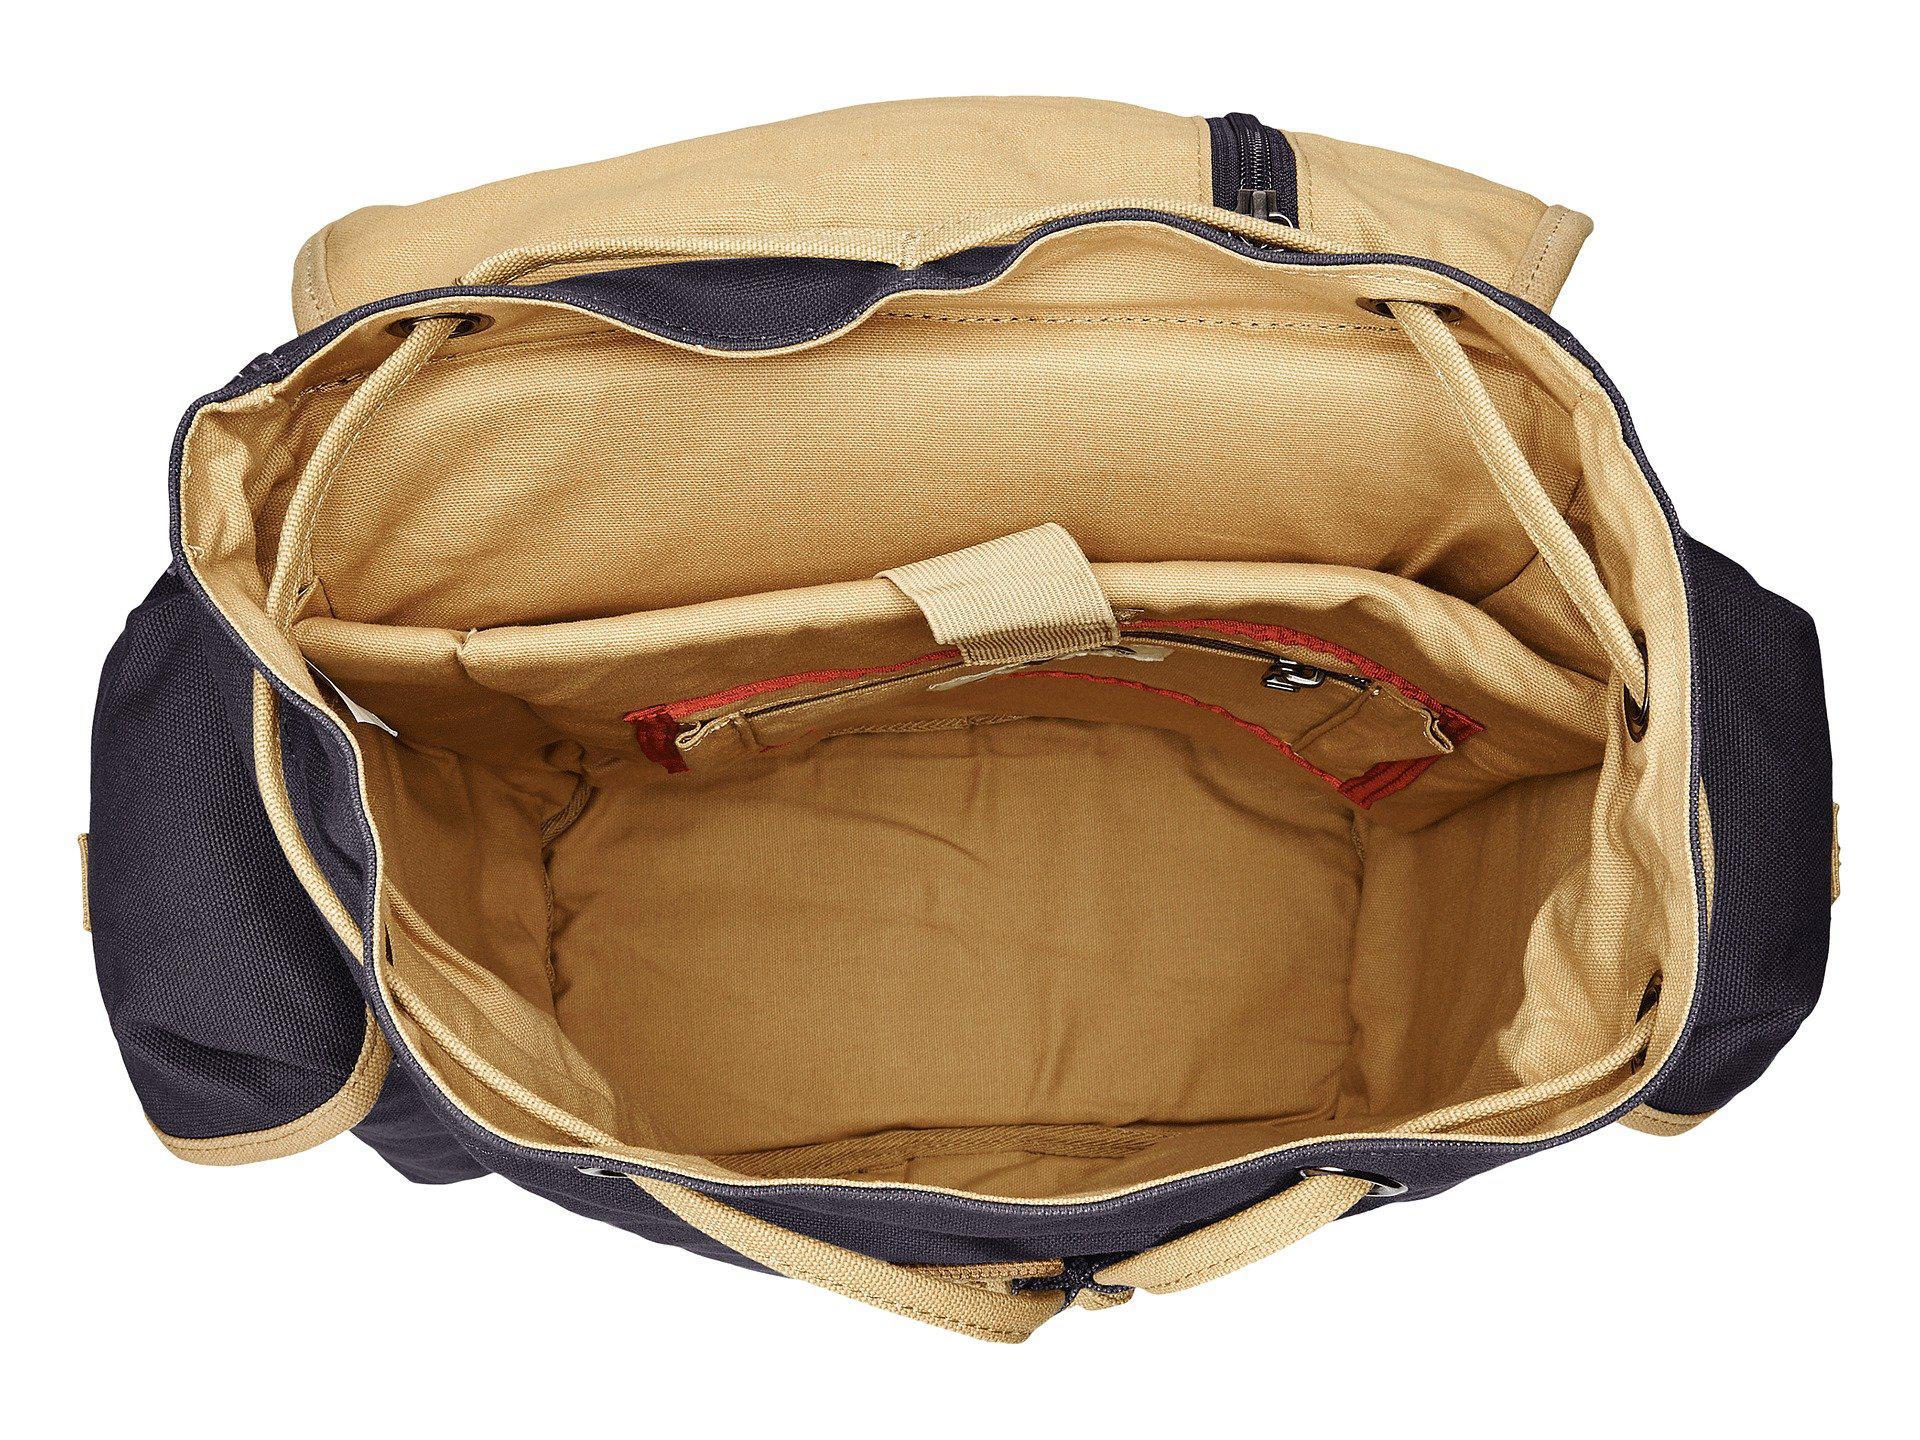 Mountain Khakis Rucksack Bag (Navy) Bags HasrTREOMW